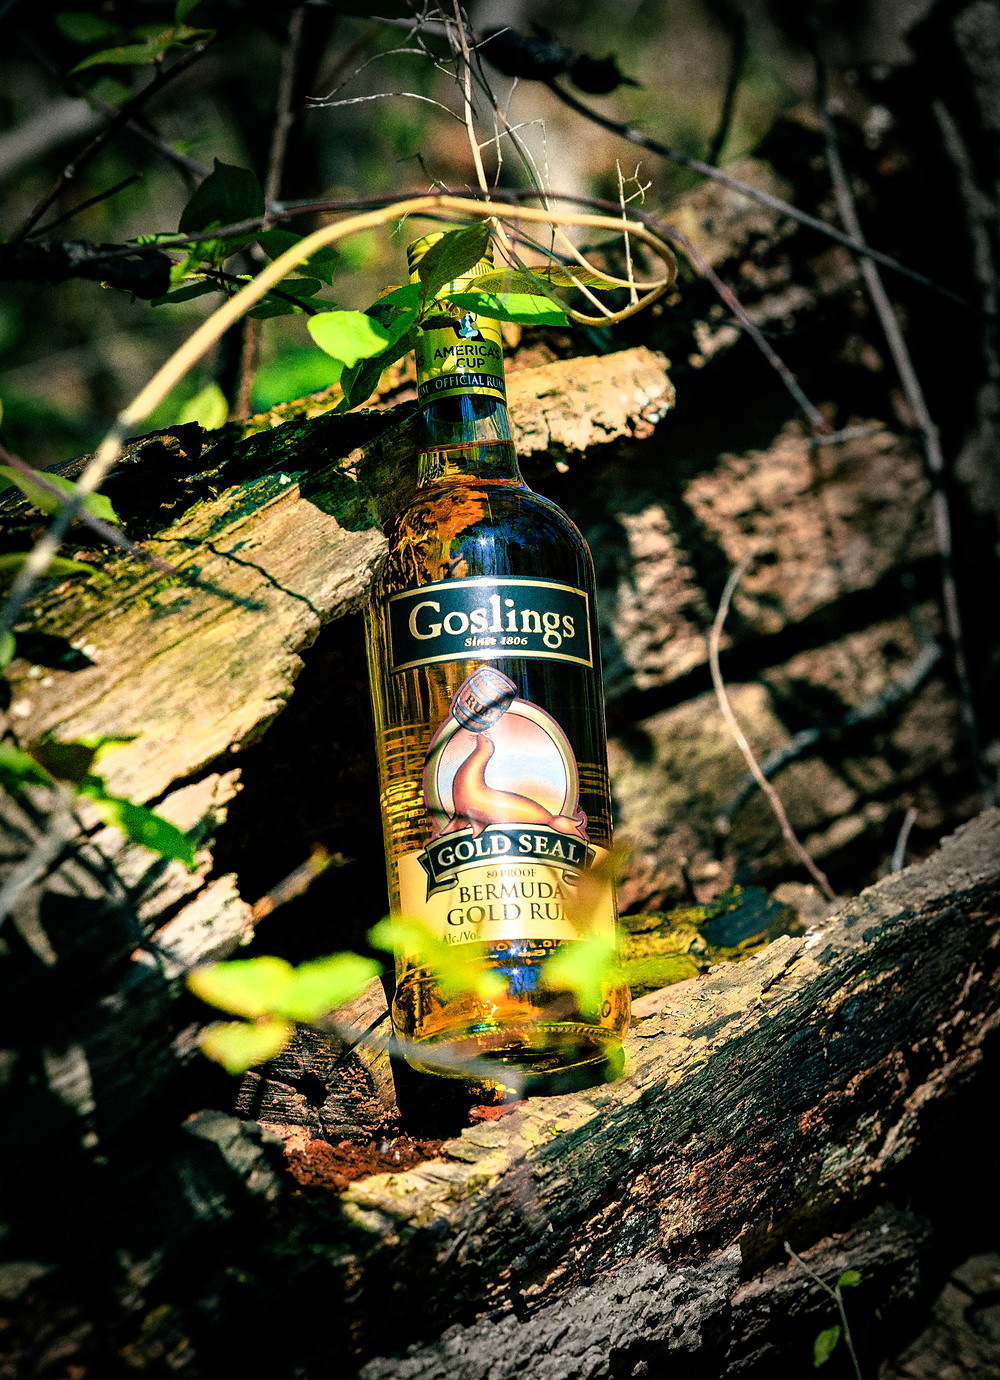 Gosling's Gold Seal Bermuda Gold Rum